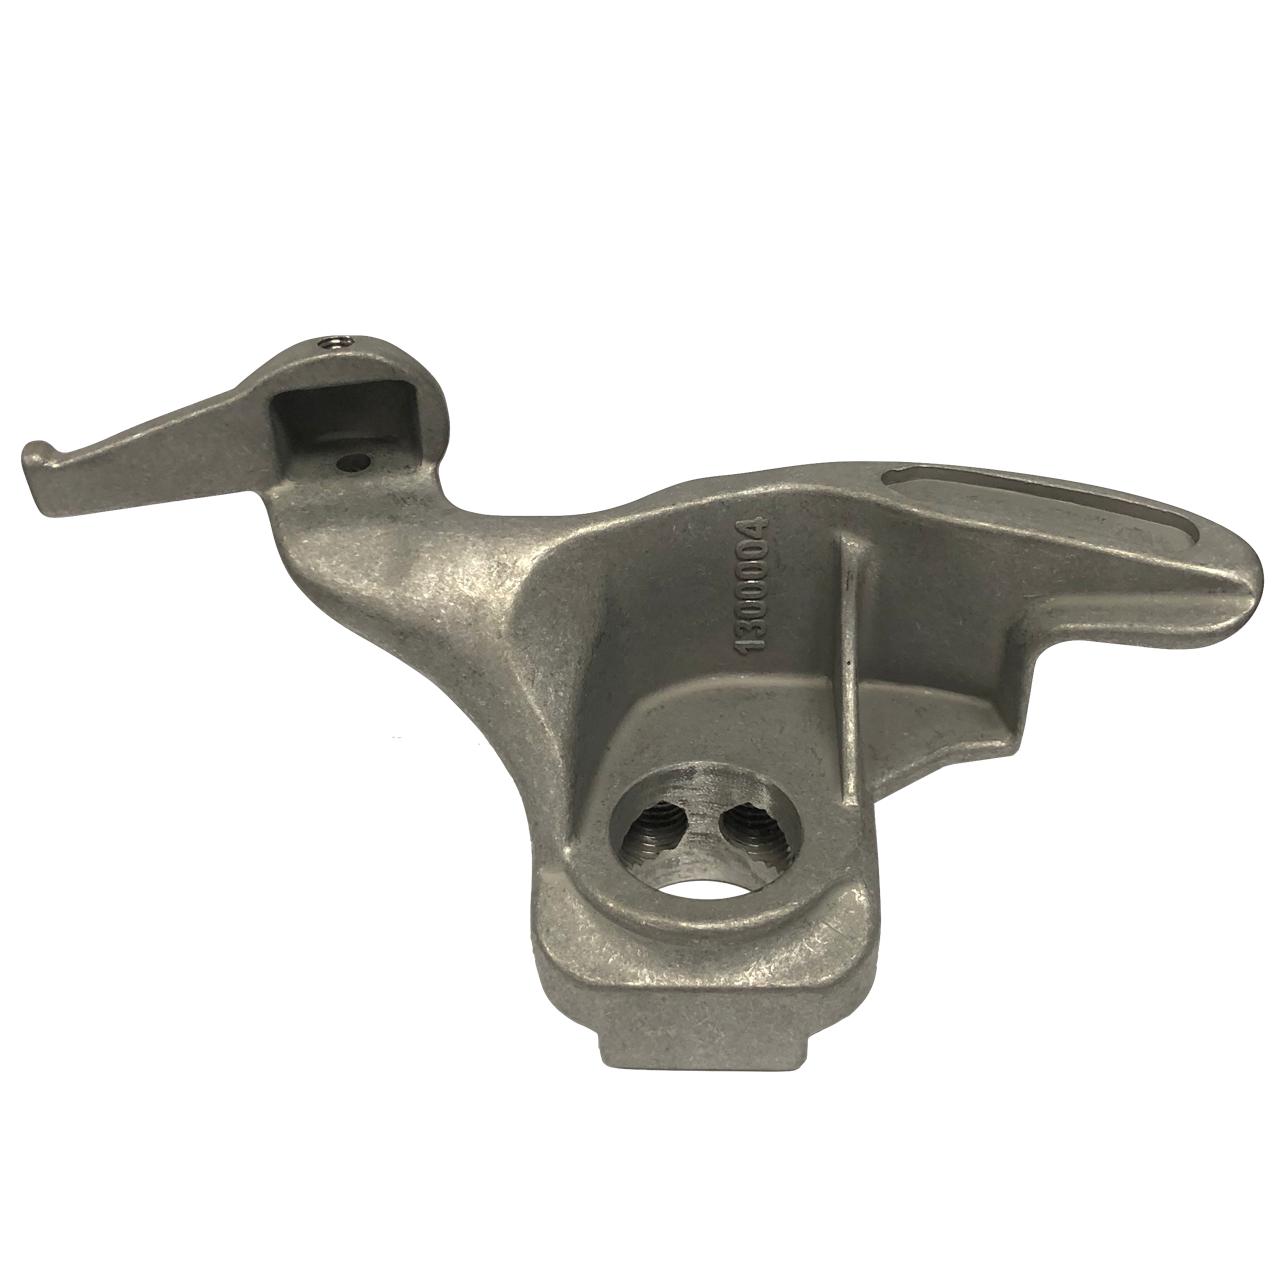 W-C-54-0001000 Steel Mount/Demount Head 890 Series for Weaver® Tire Changers